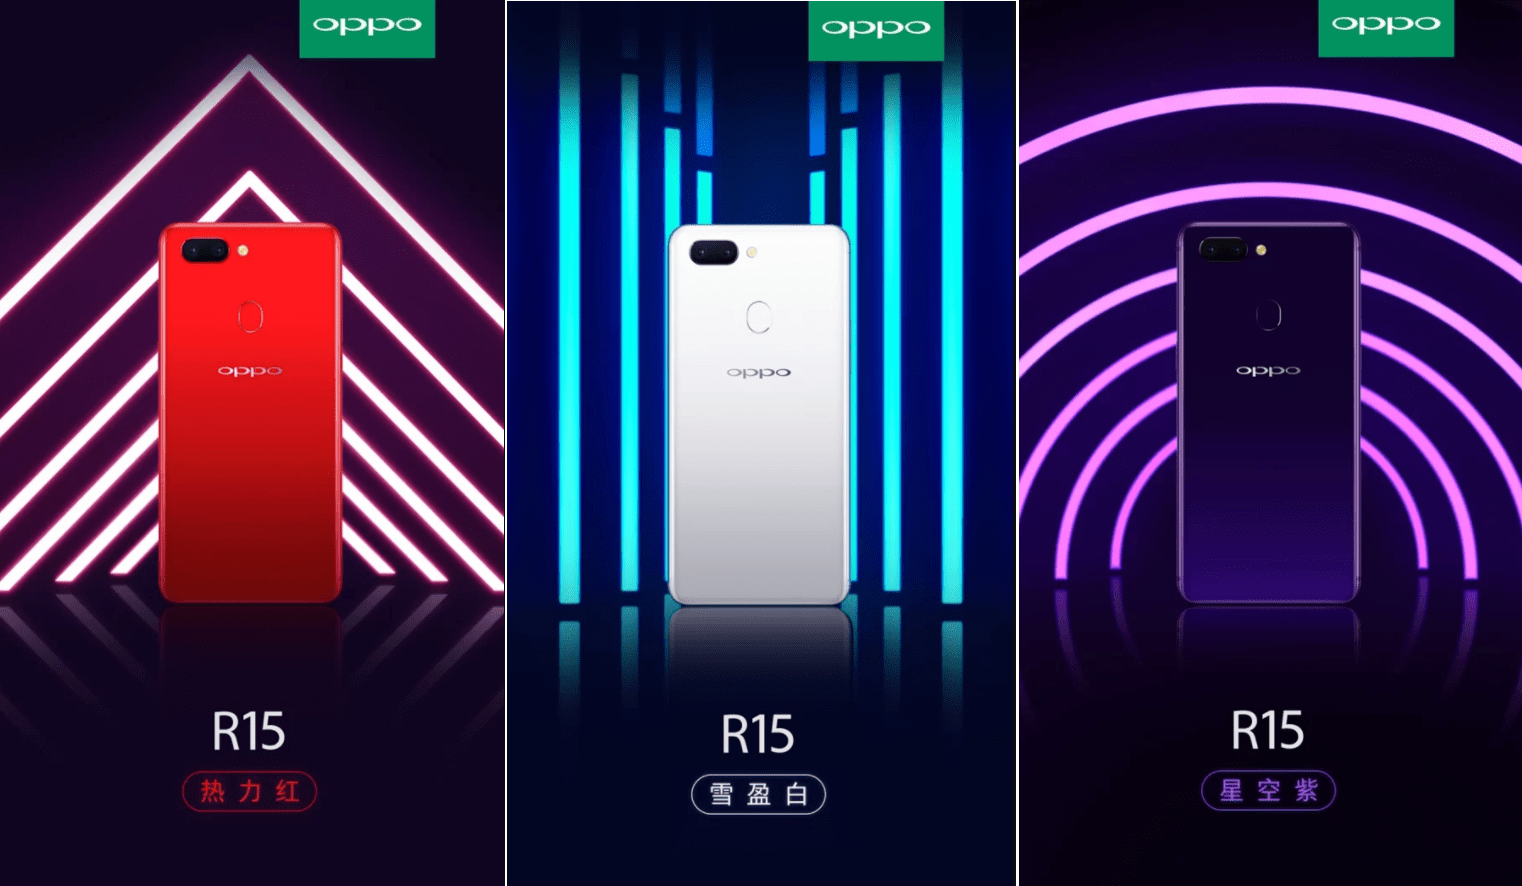 Oppo R15 Full Specifications